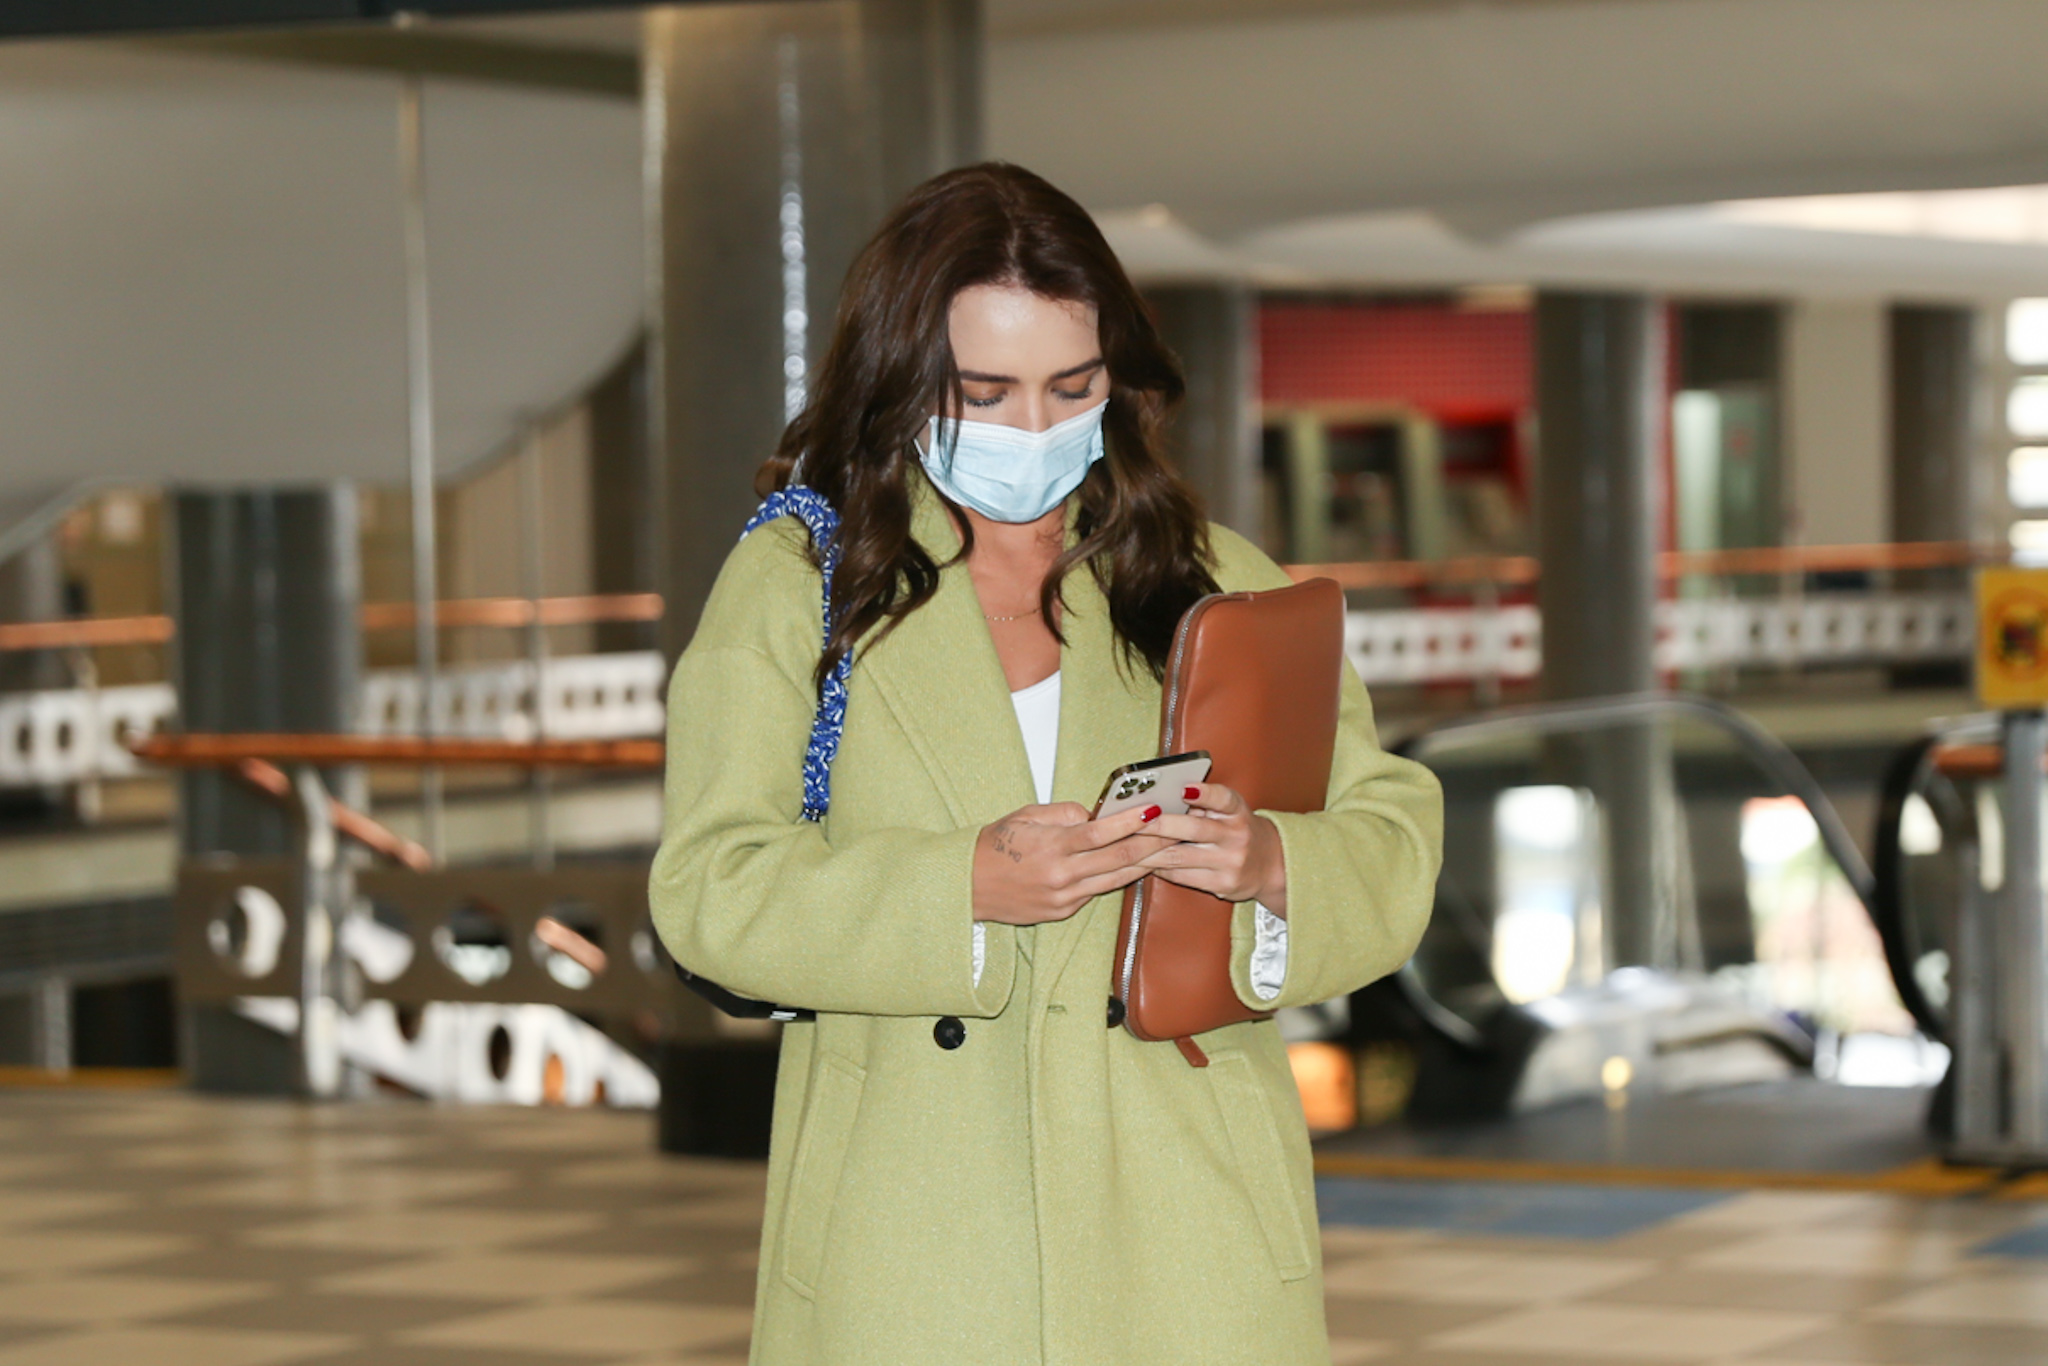 Rafa Kalimann exibe novo visual em aeroporto